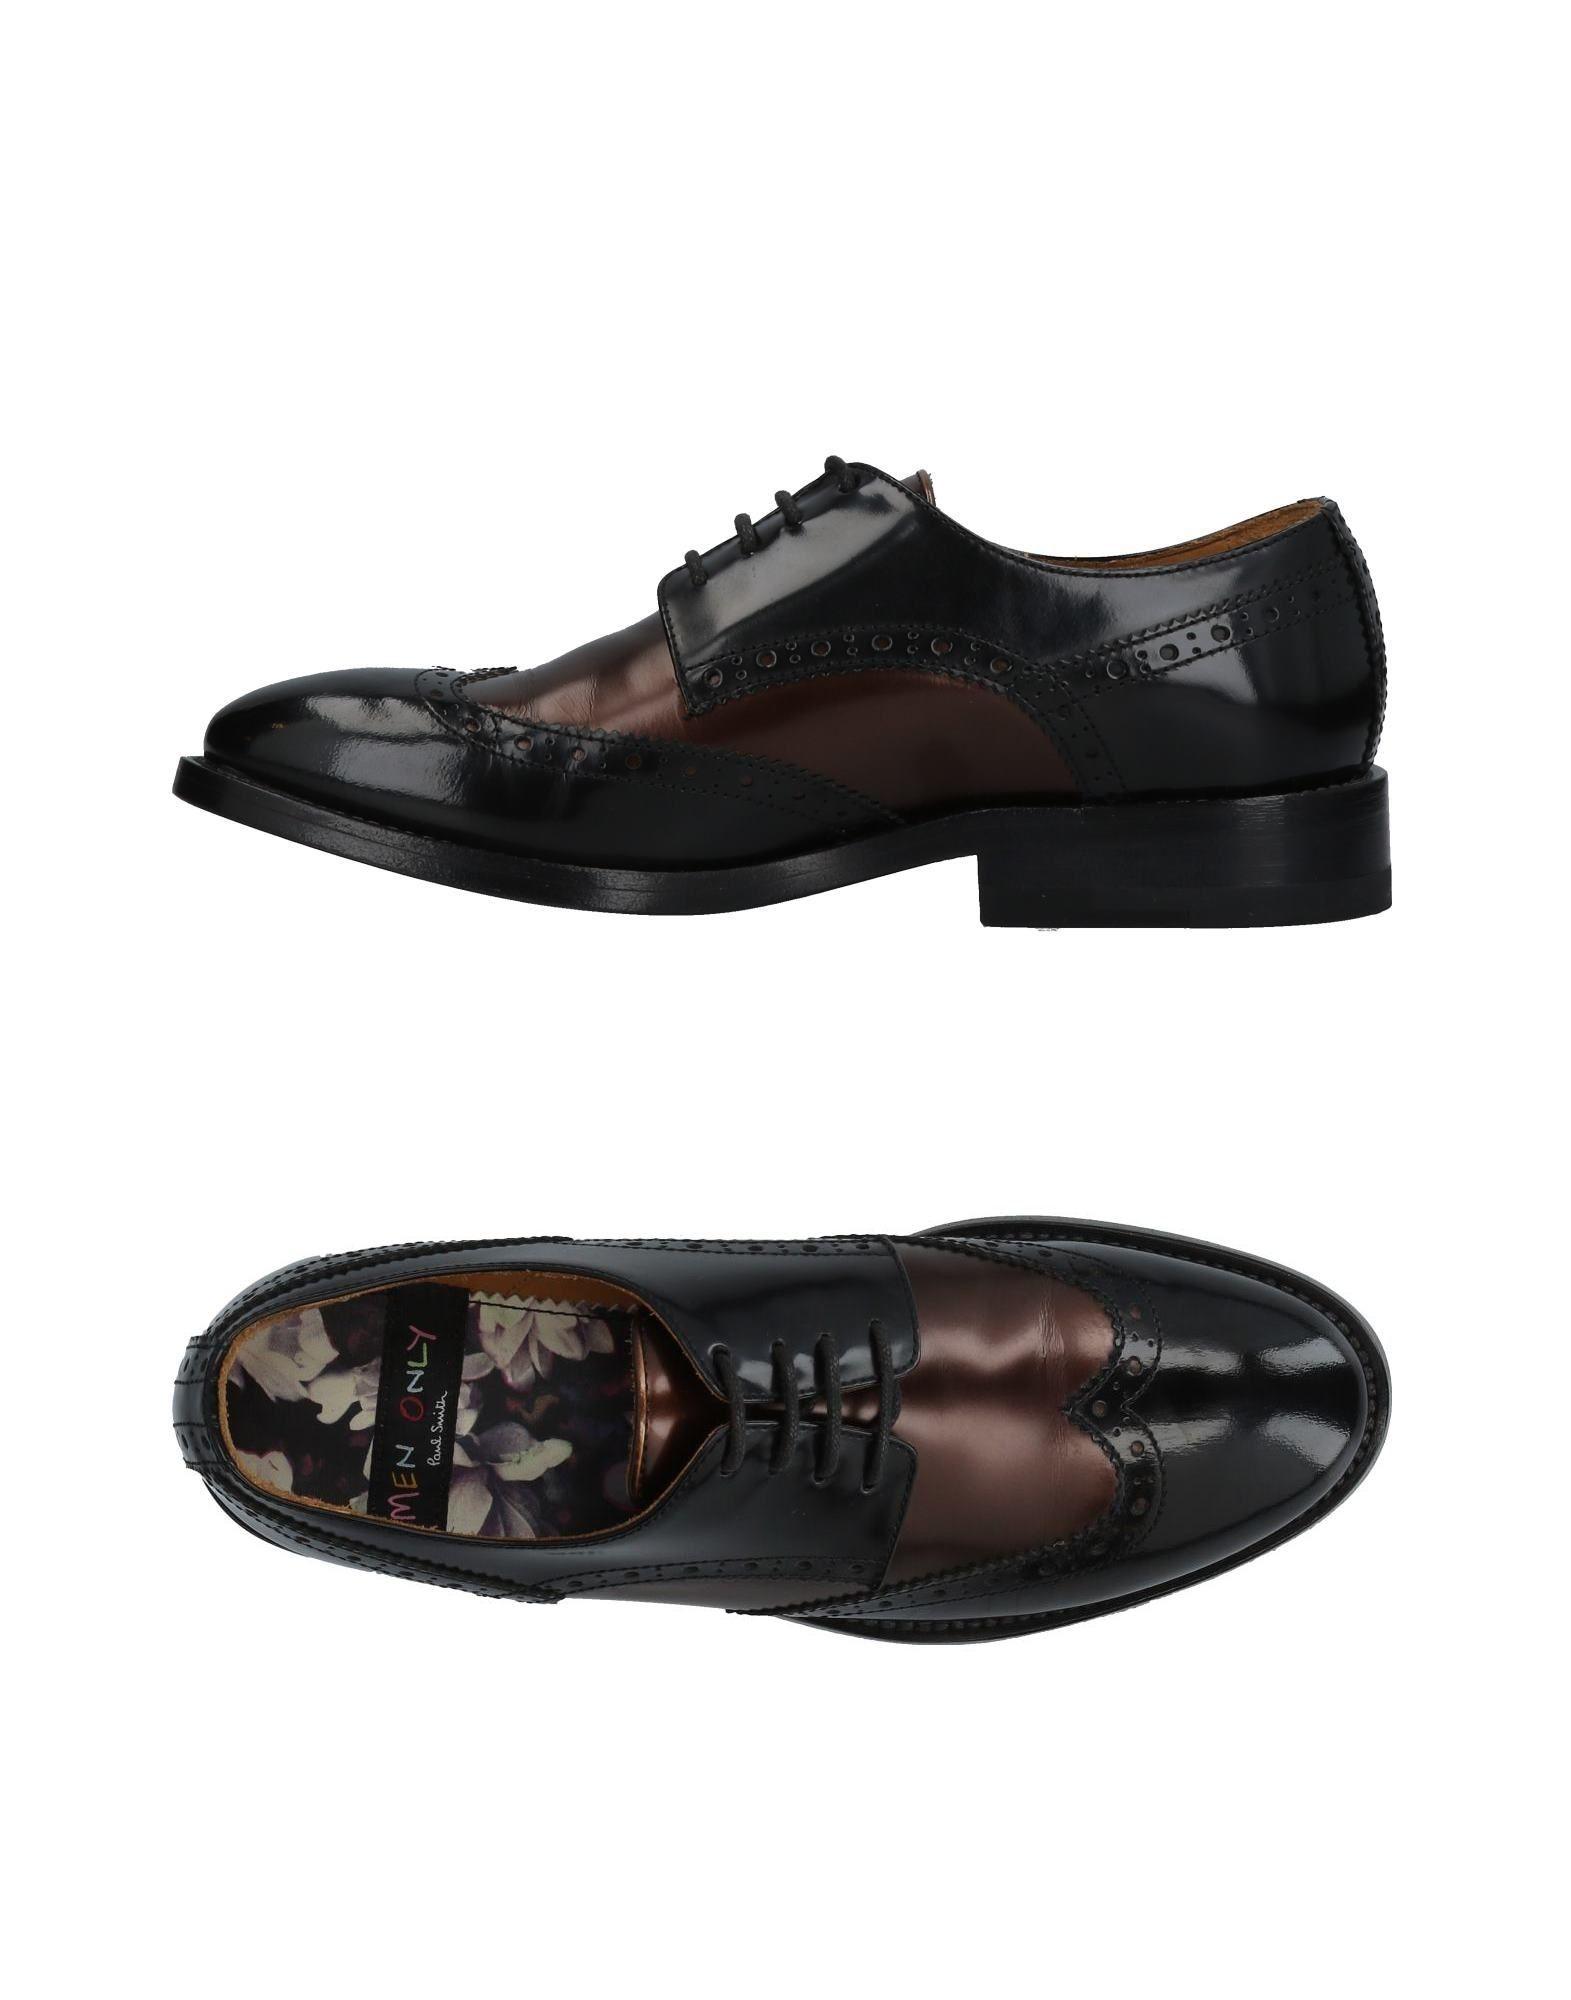 Chaussures À Lacets Men Only Paul Smith Femme - Chaussures À Lacets Men Only Paul Smith sur